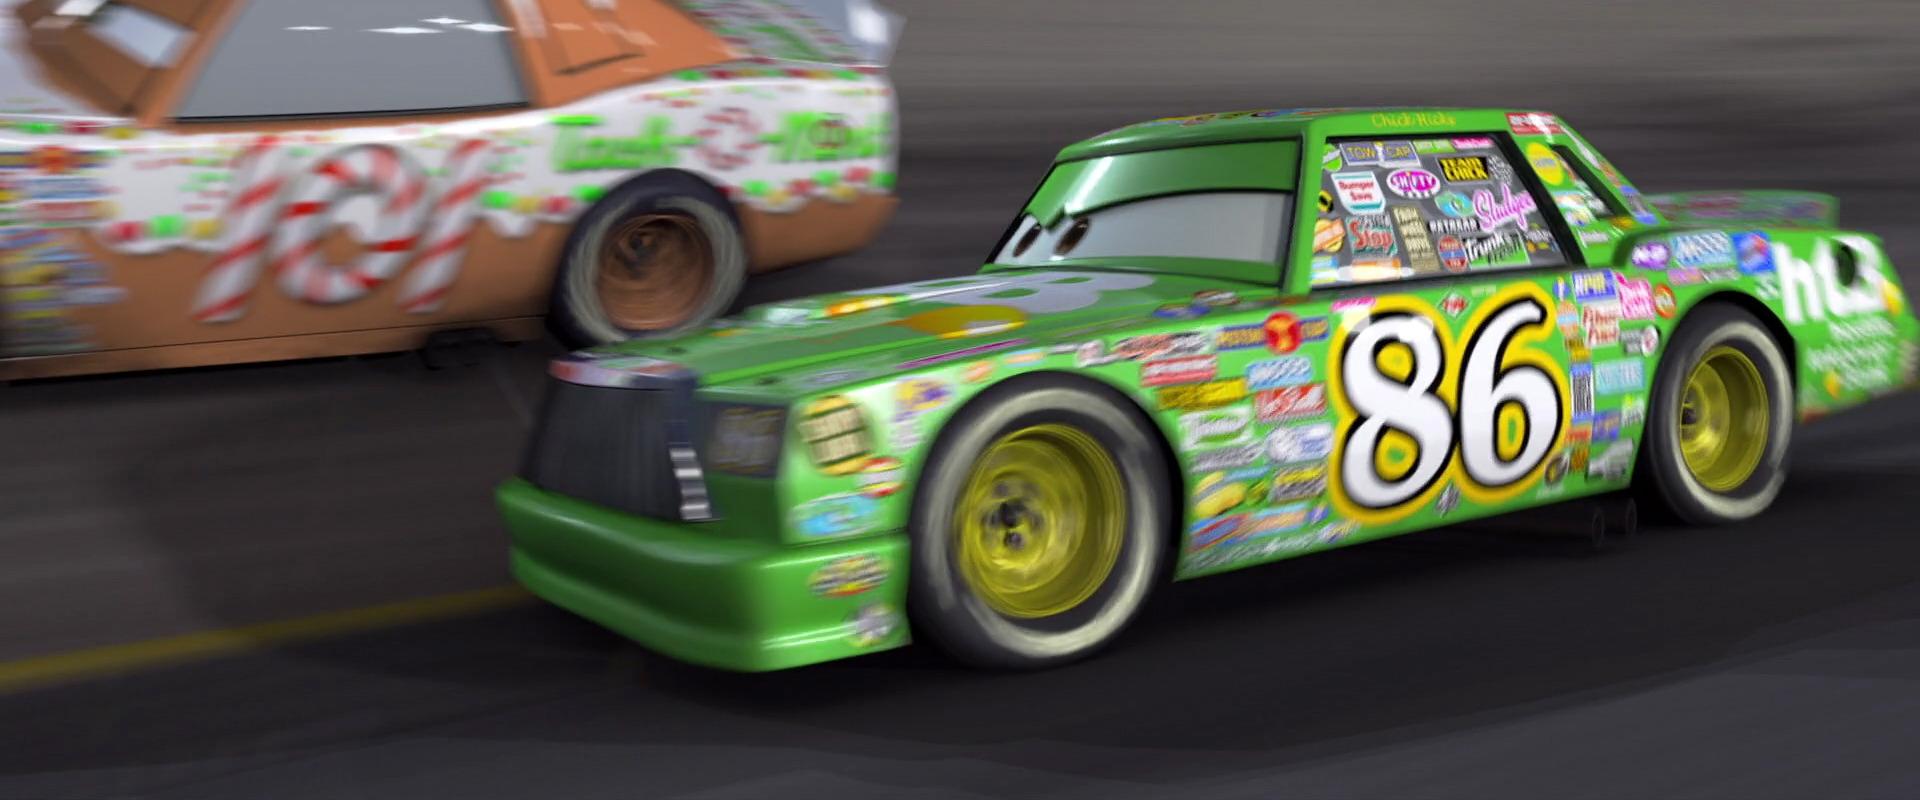 Greg Candyman | World of Cars Wiki | FANDOM powered by Wikia